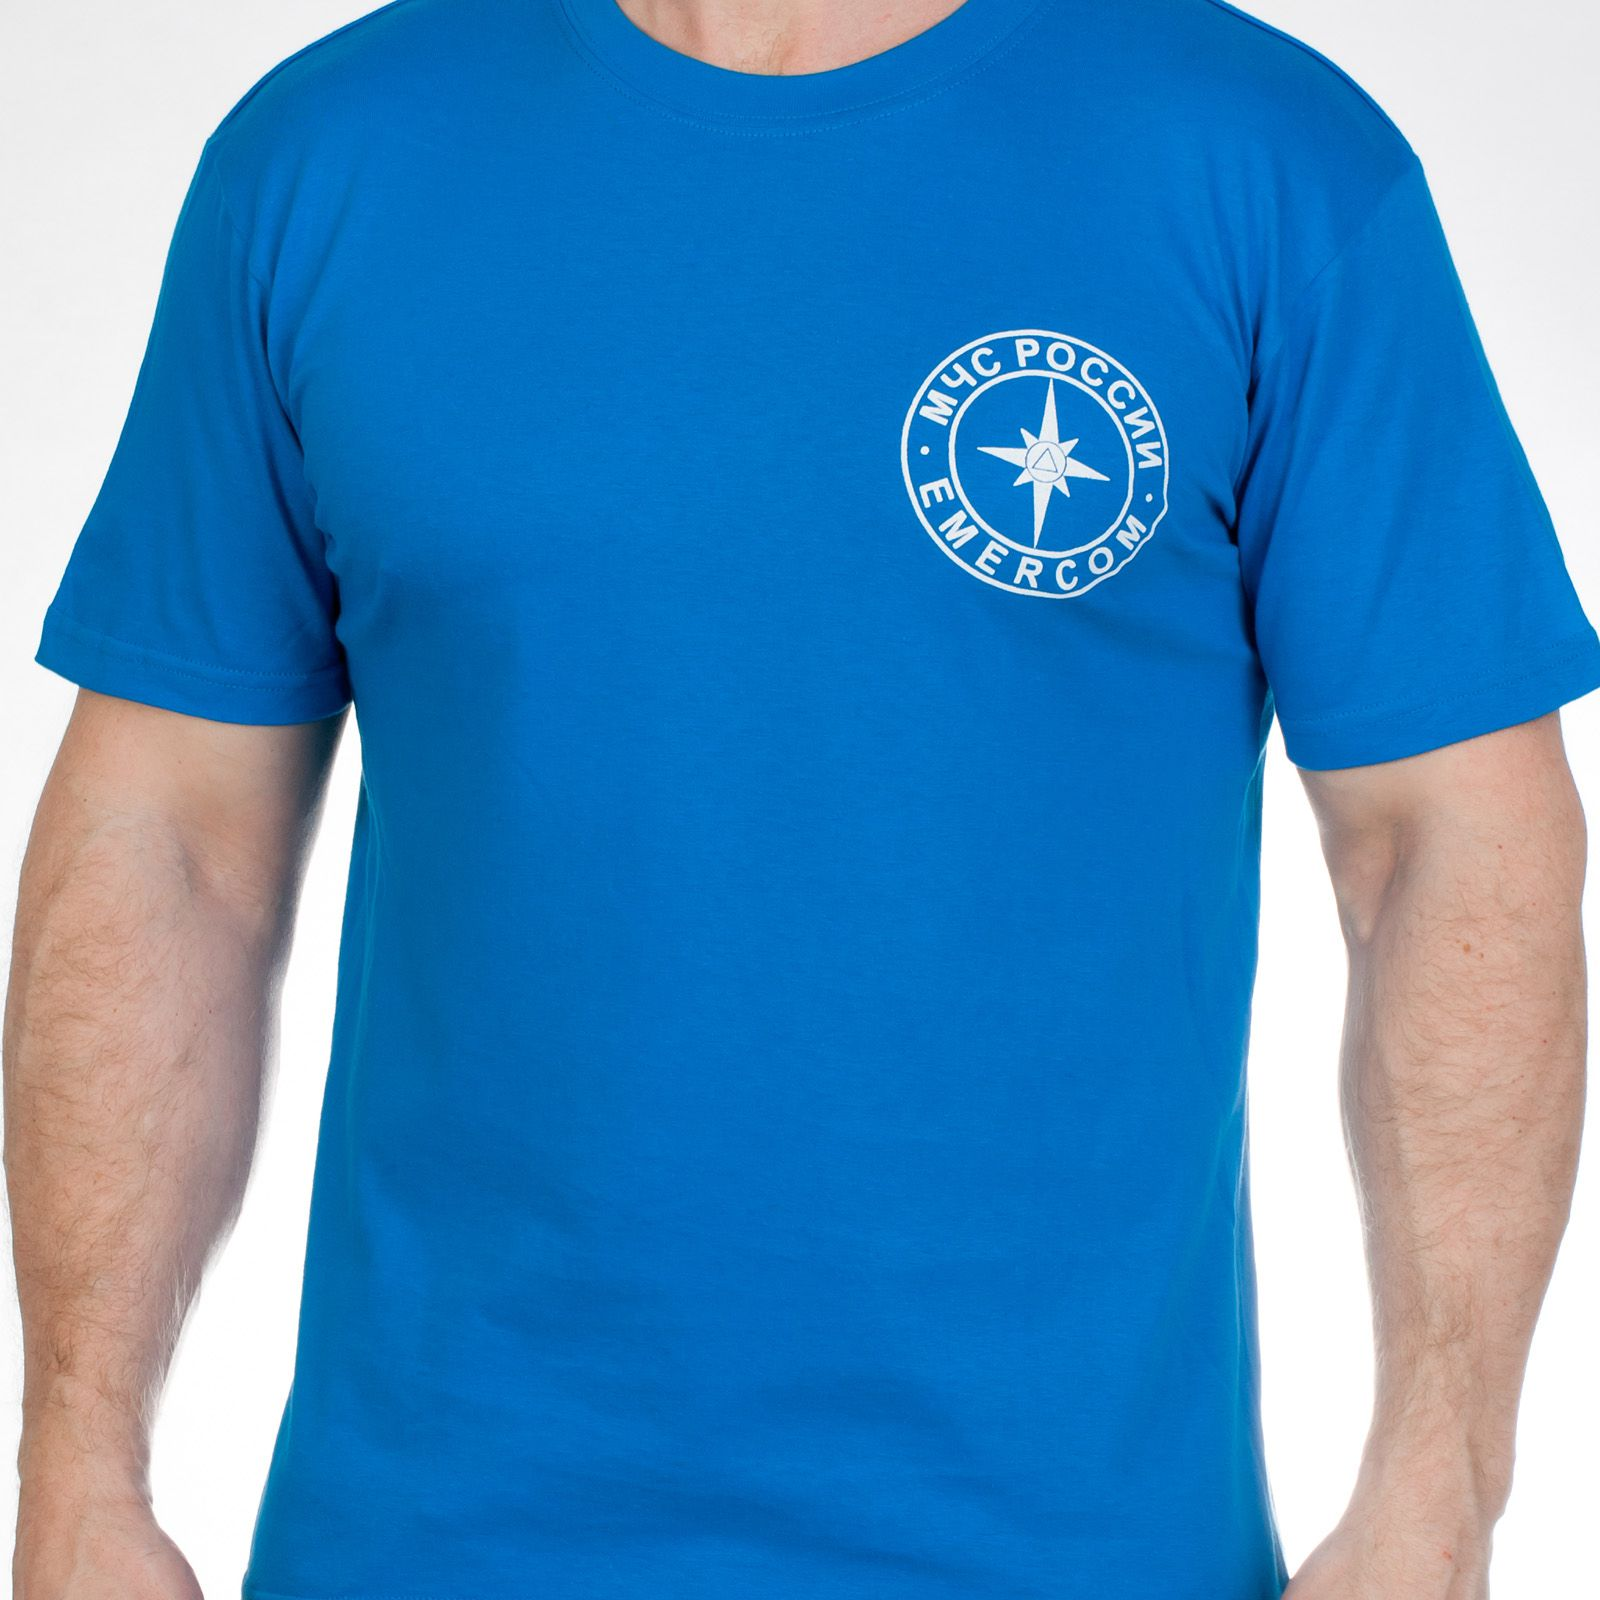 Купить футболку на праздник МЧС